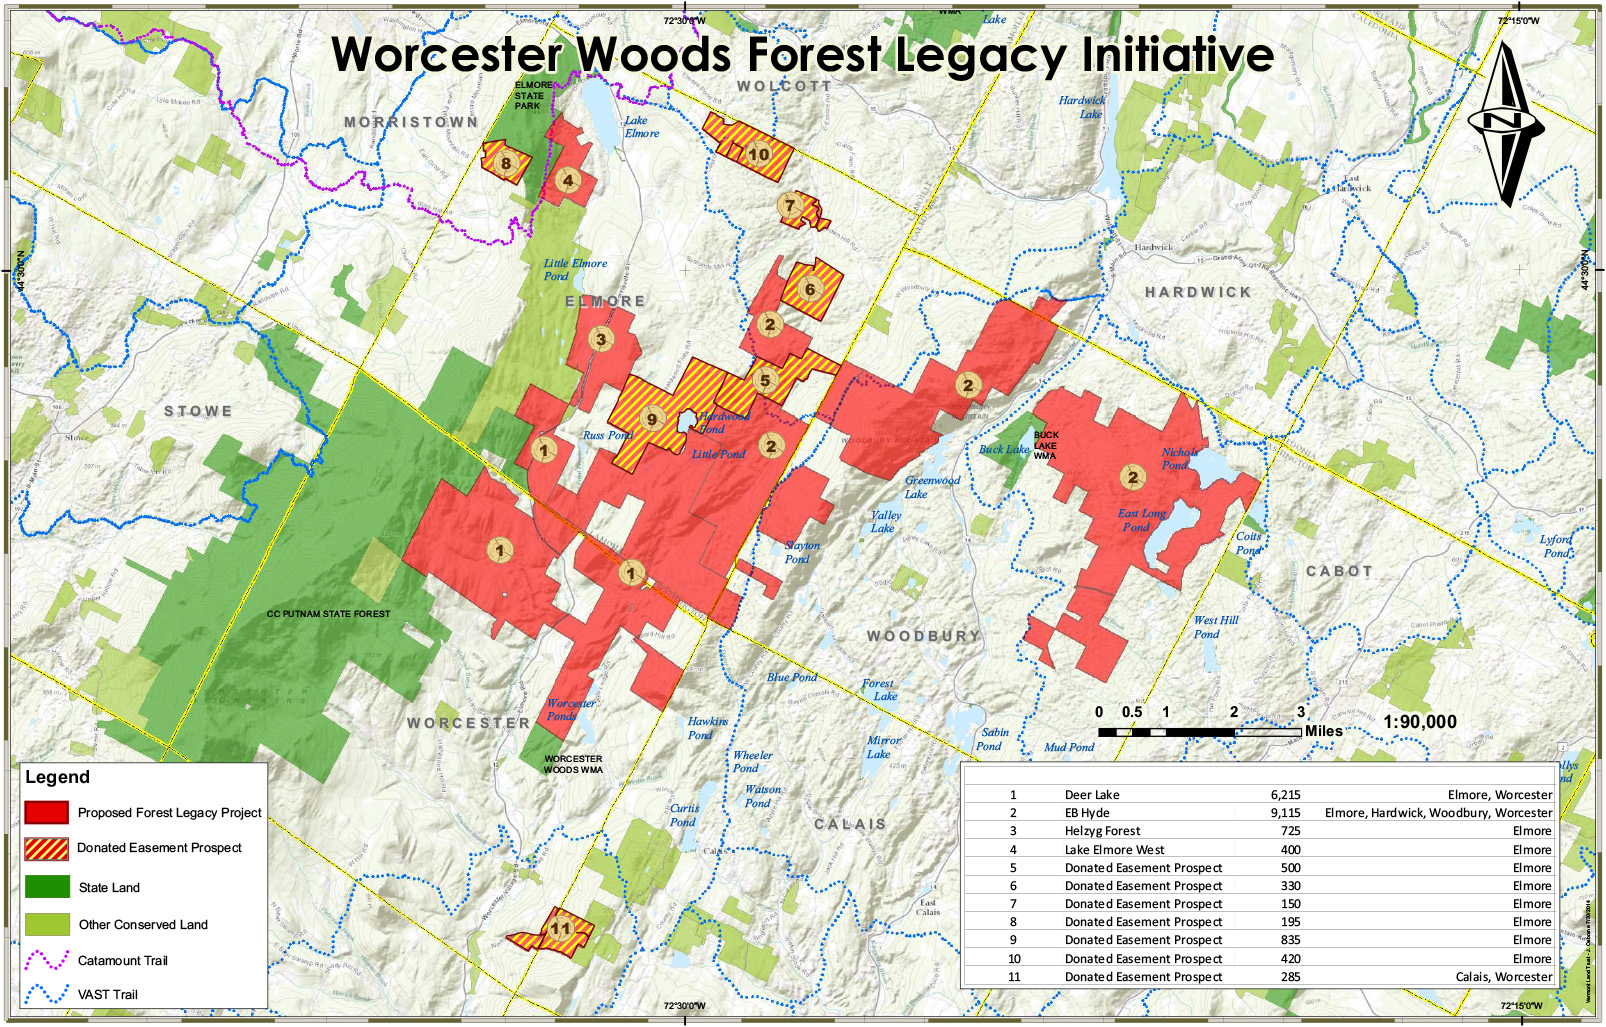 Land Trust GIS - Map us land acquisitions